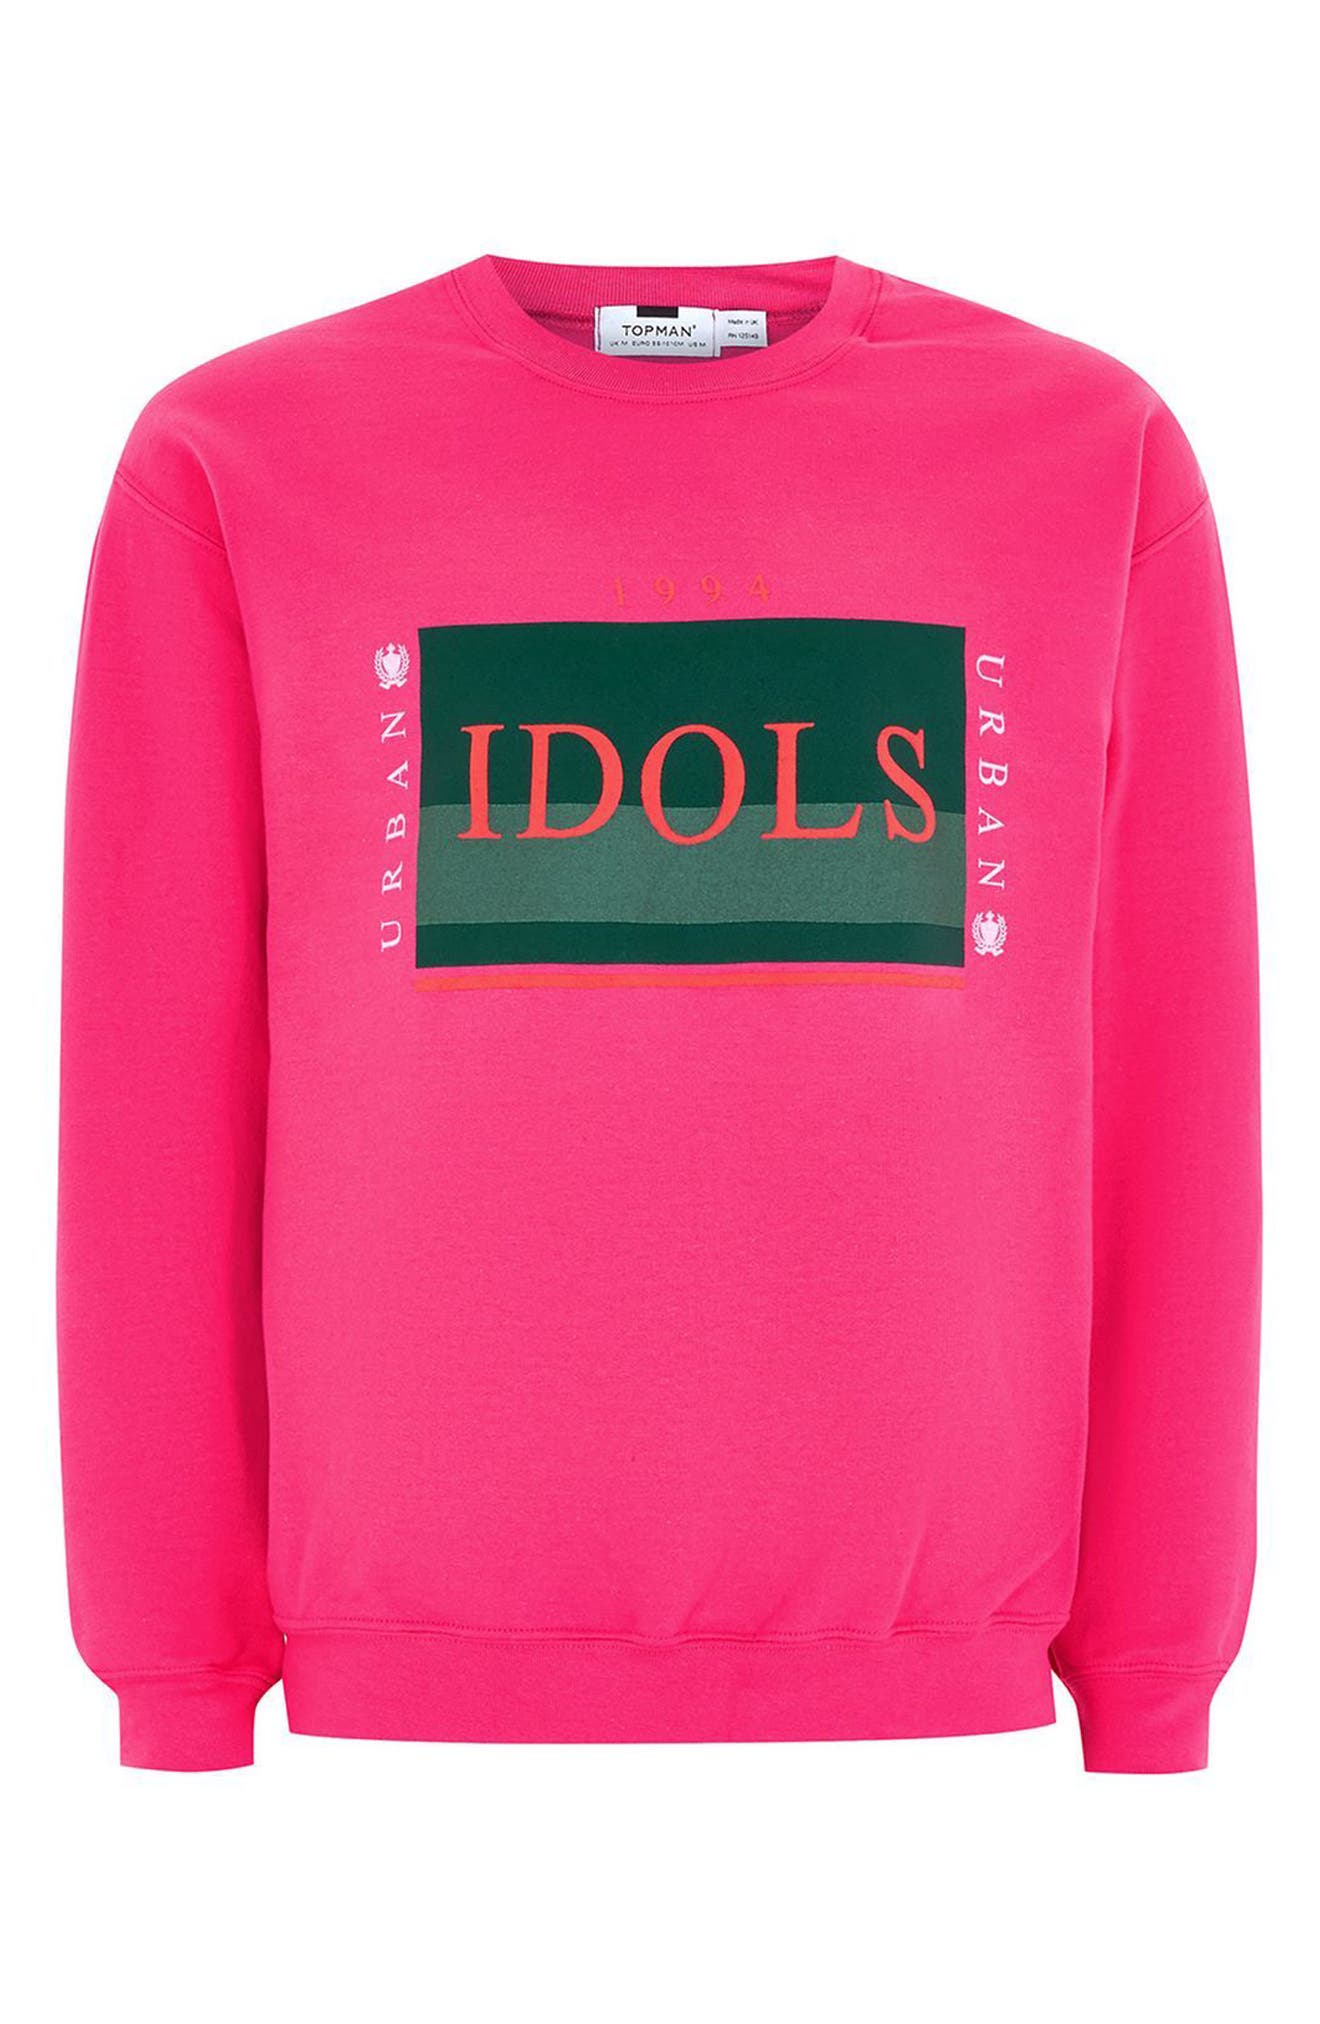 Urban Idols Graphic Sweatshirt,                             Alternate thumbnail 4, color,                             650